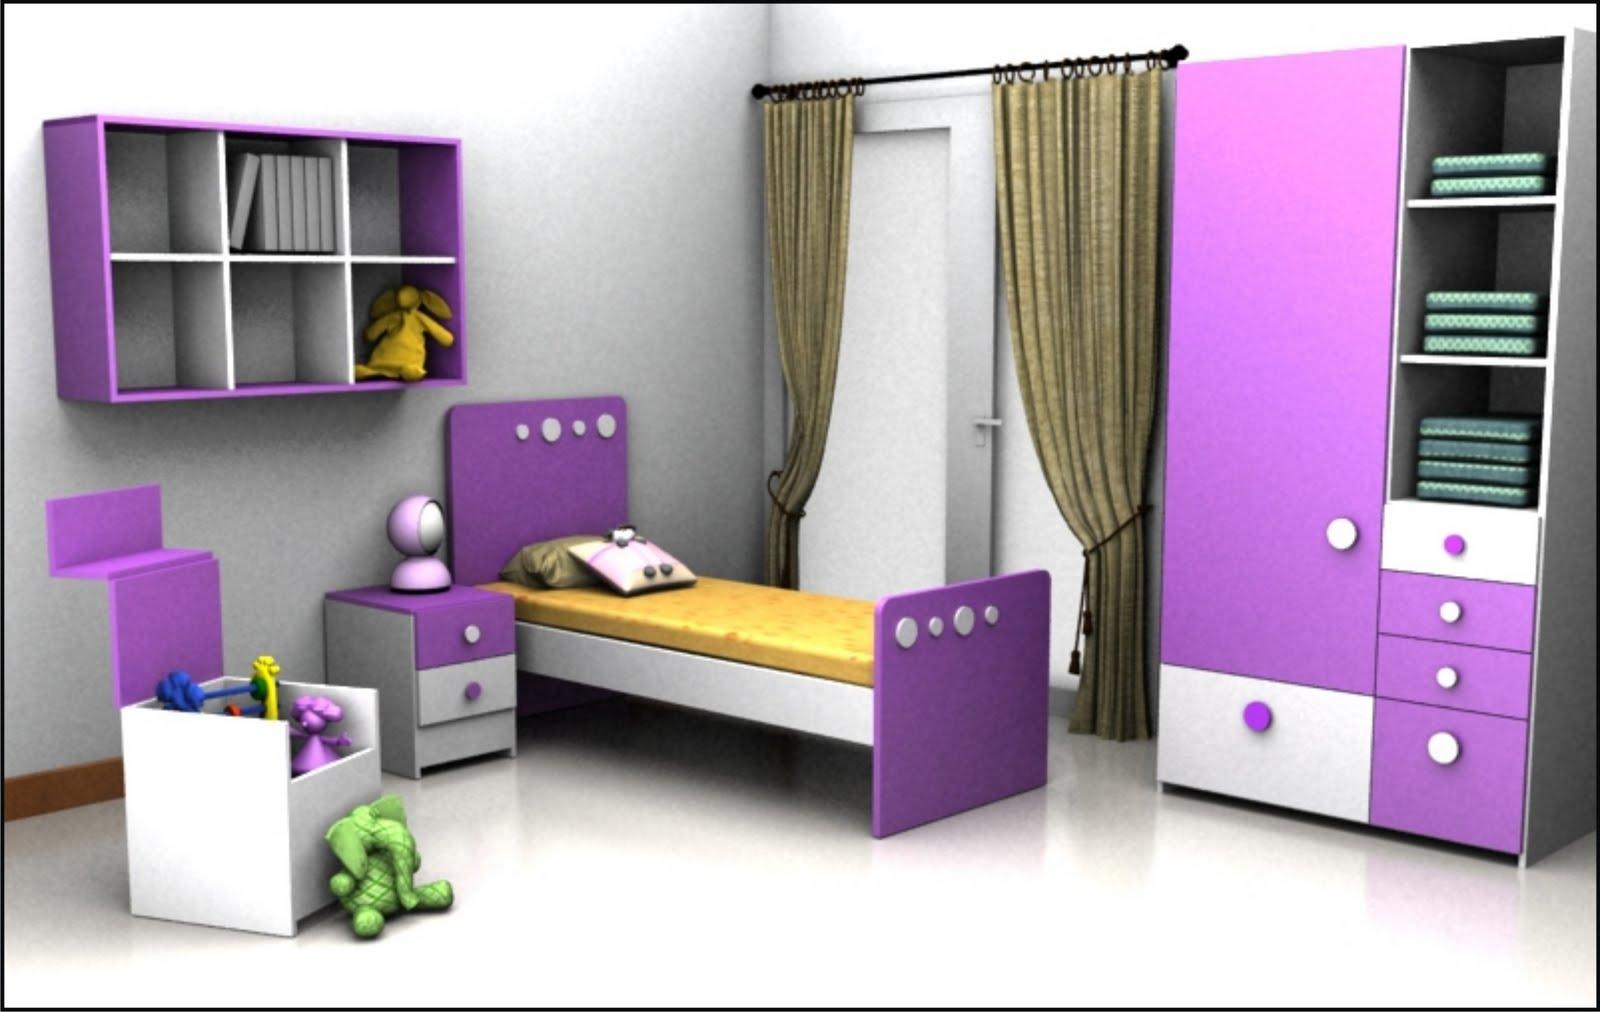 Grupo impronta dise o equipamiento para habitaci n infantil - Diseno habitacion infantil ...